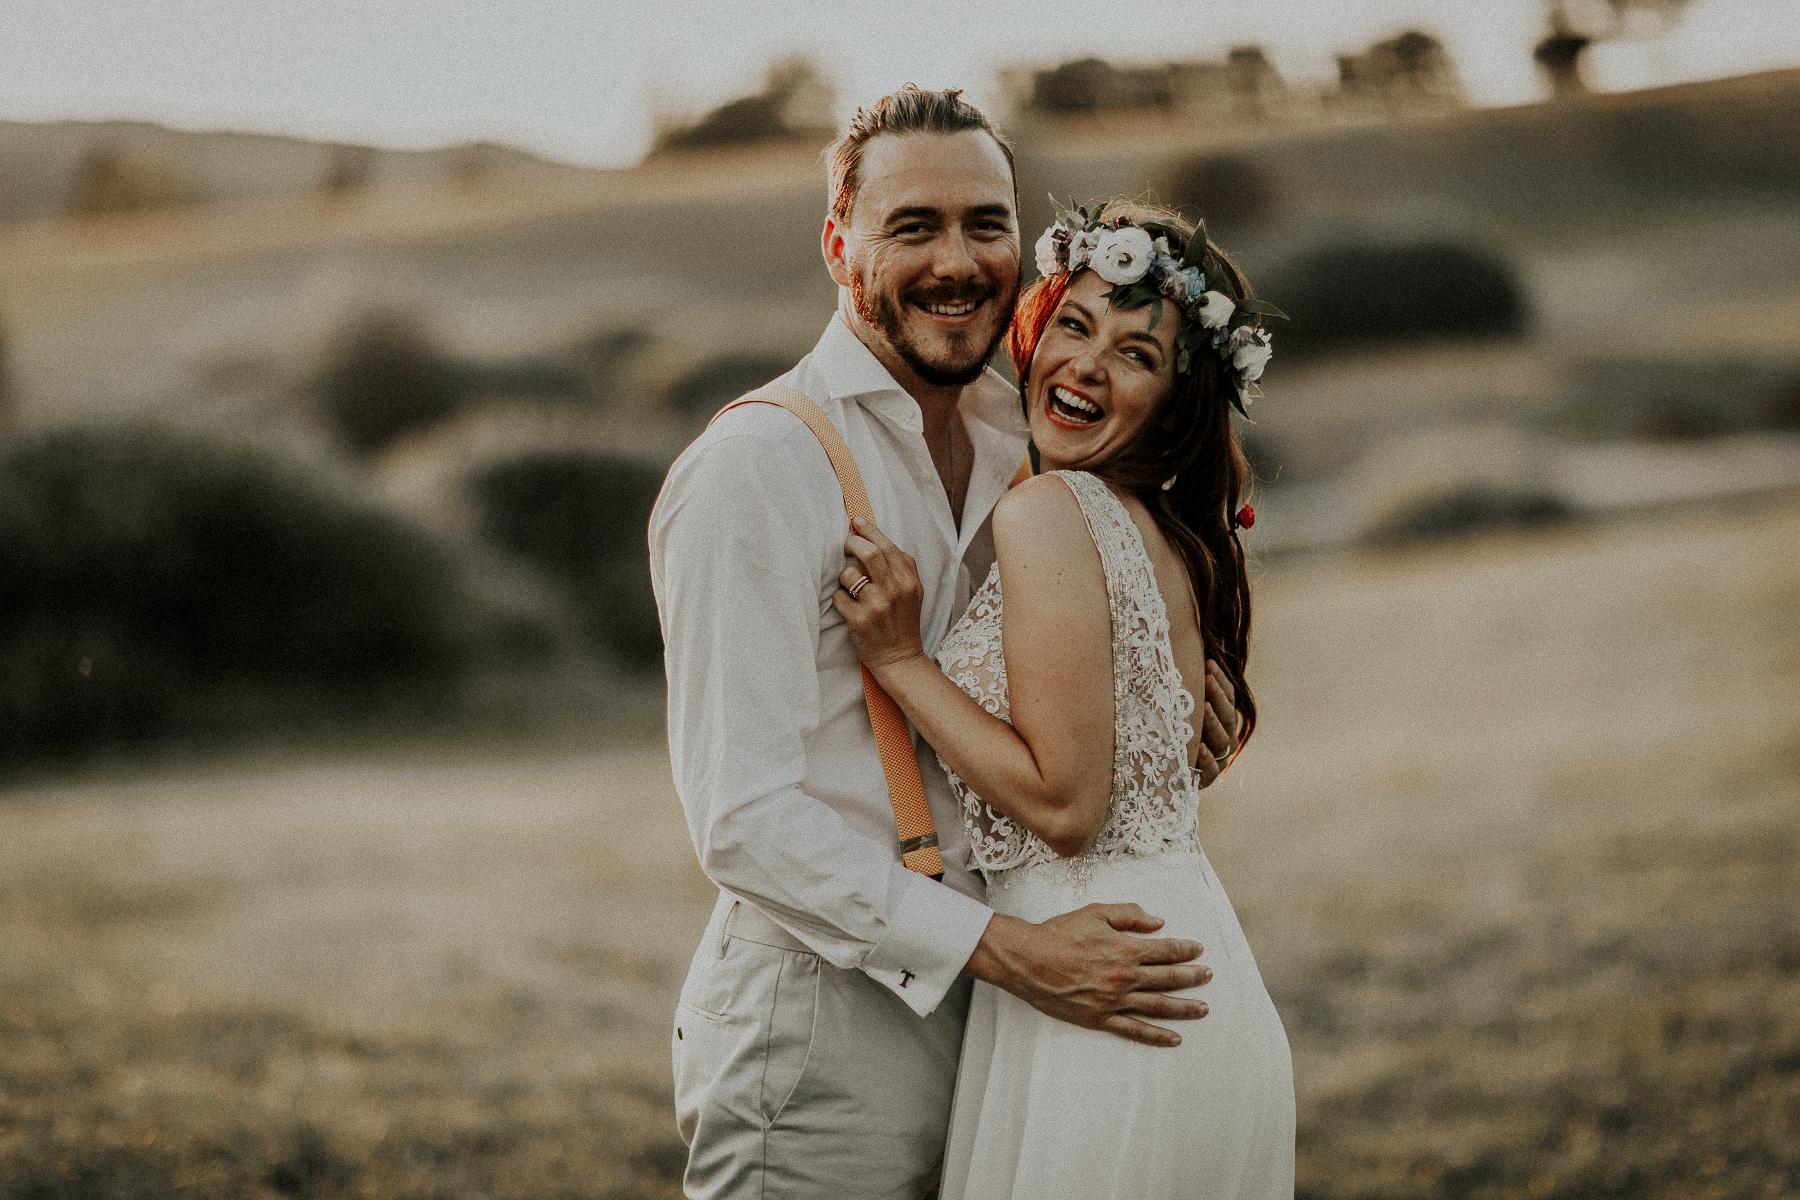 #fotograf-Slovensko, #vychod, #LubosKrahulec, #tatry, #SlovenskyRaj, #svadobnefotenie, #AsociáciaSlovenskychSvadobnychFotografov, #fotograftatry, #fotenieVrieke, #svadba-v-prirode,